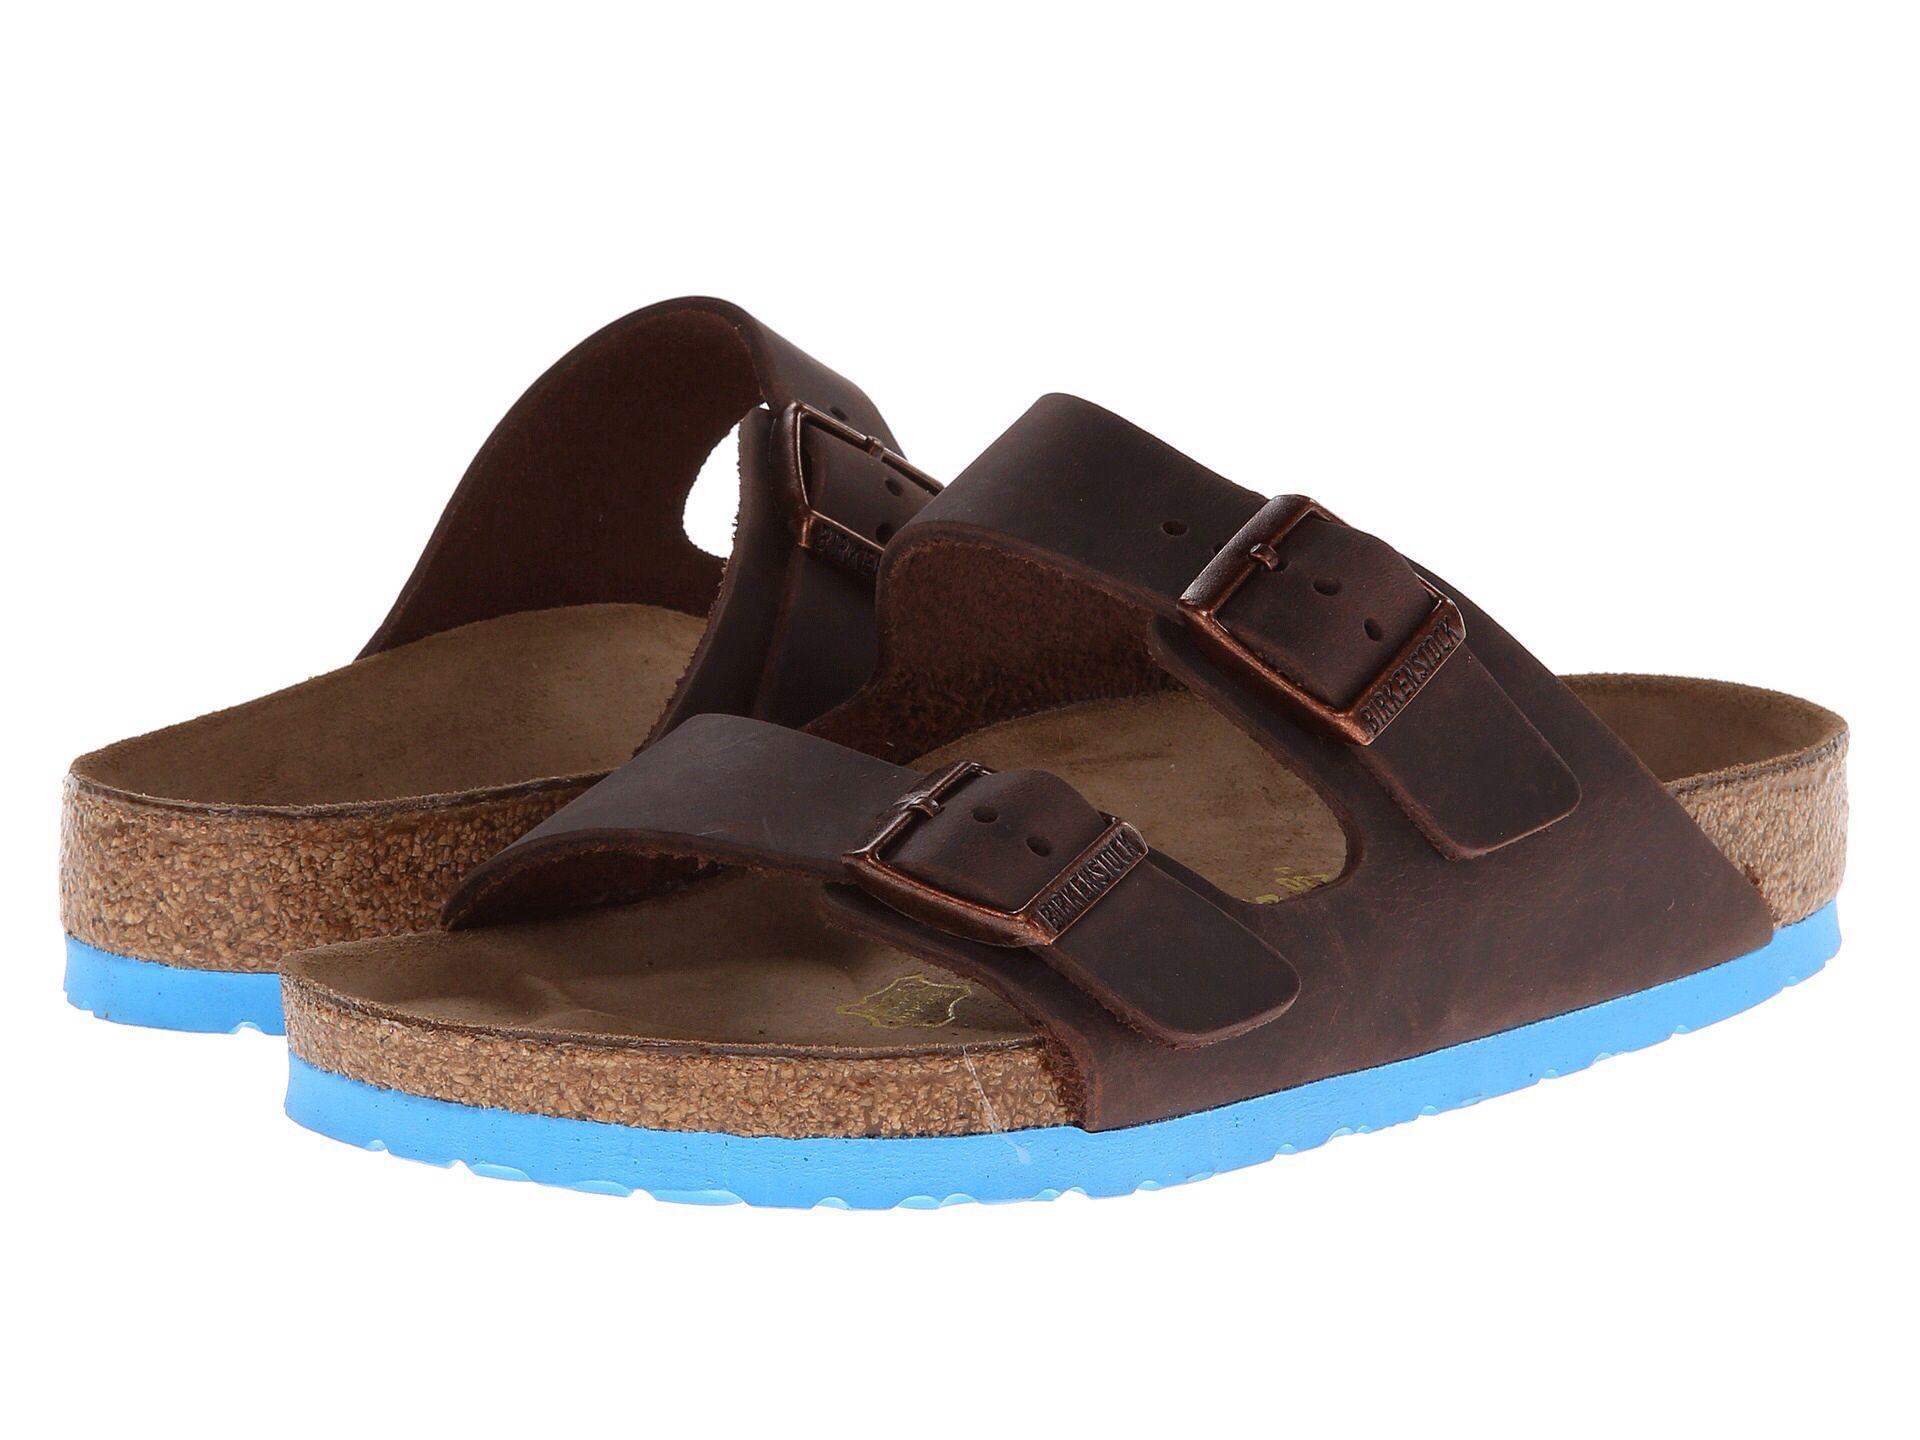 e2396f74ea36b5 The 9 Best Walking Sandals of 2019